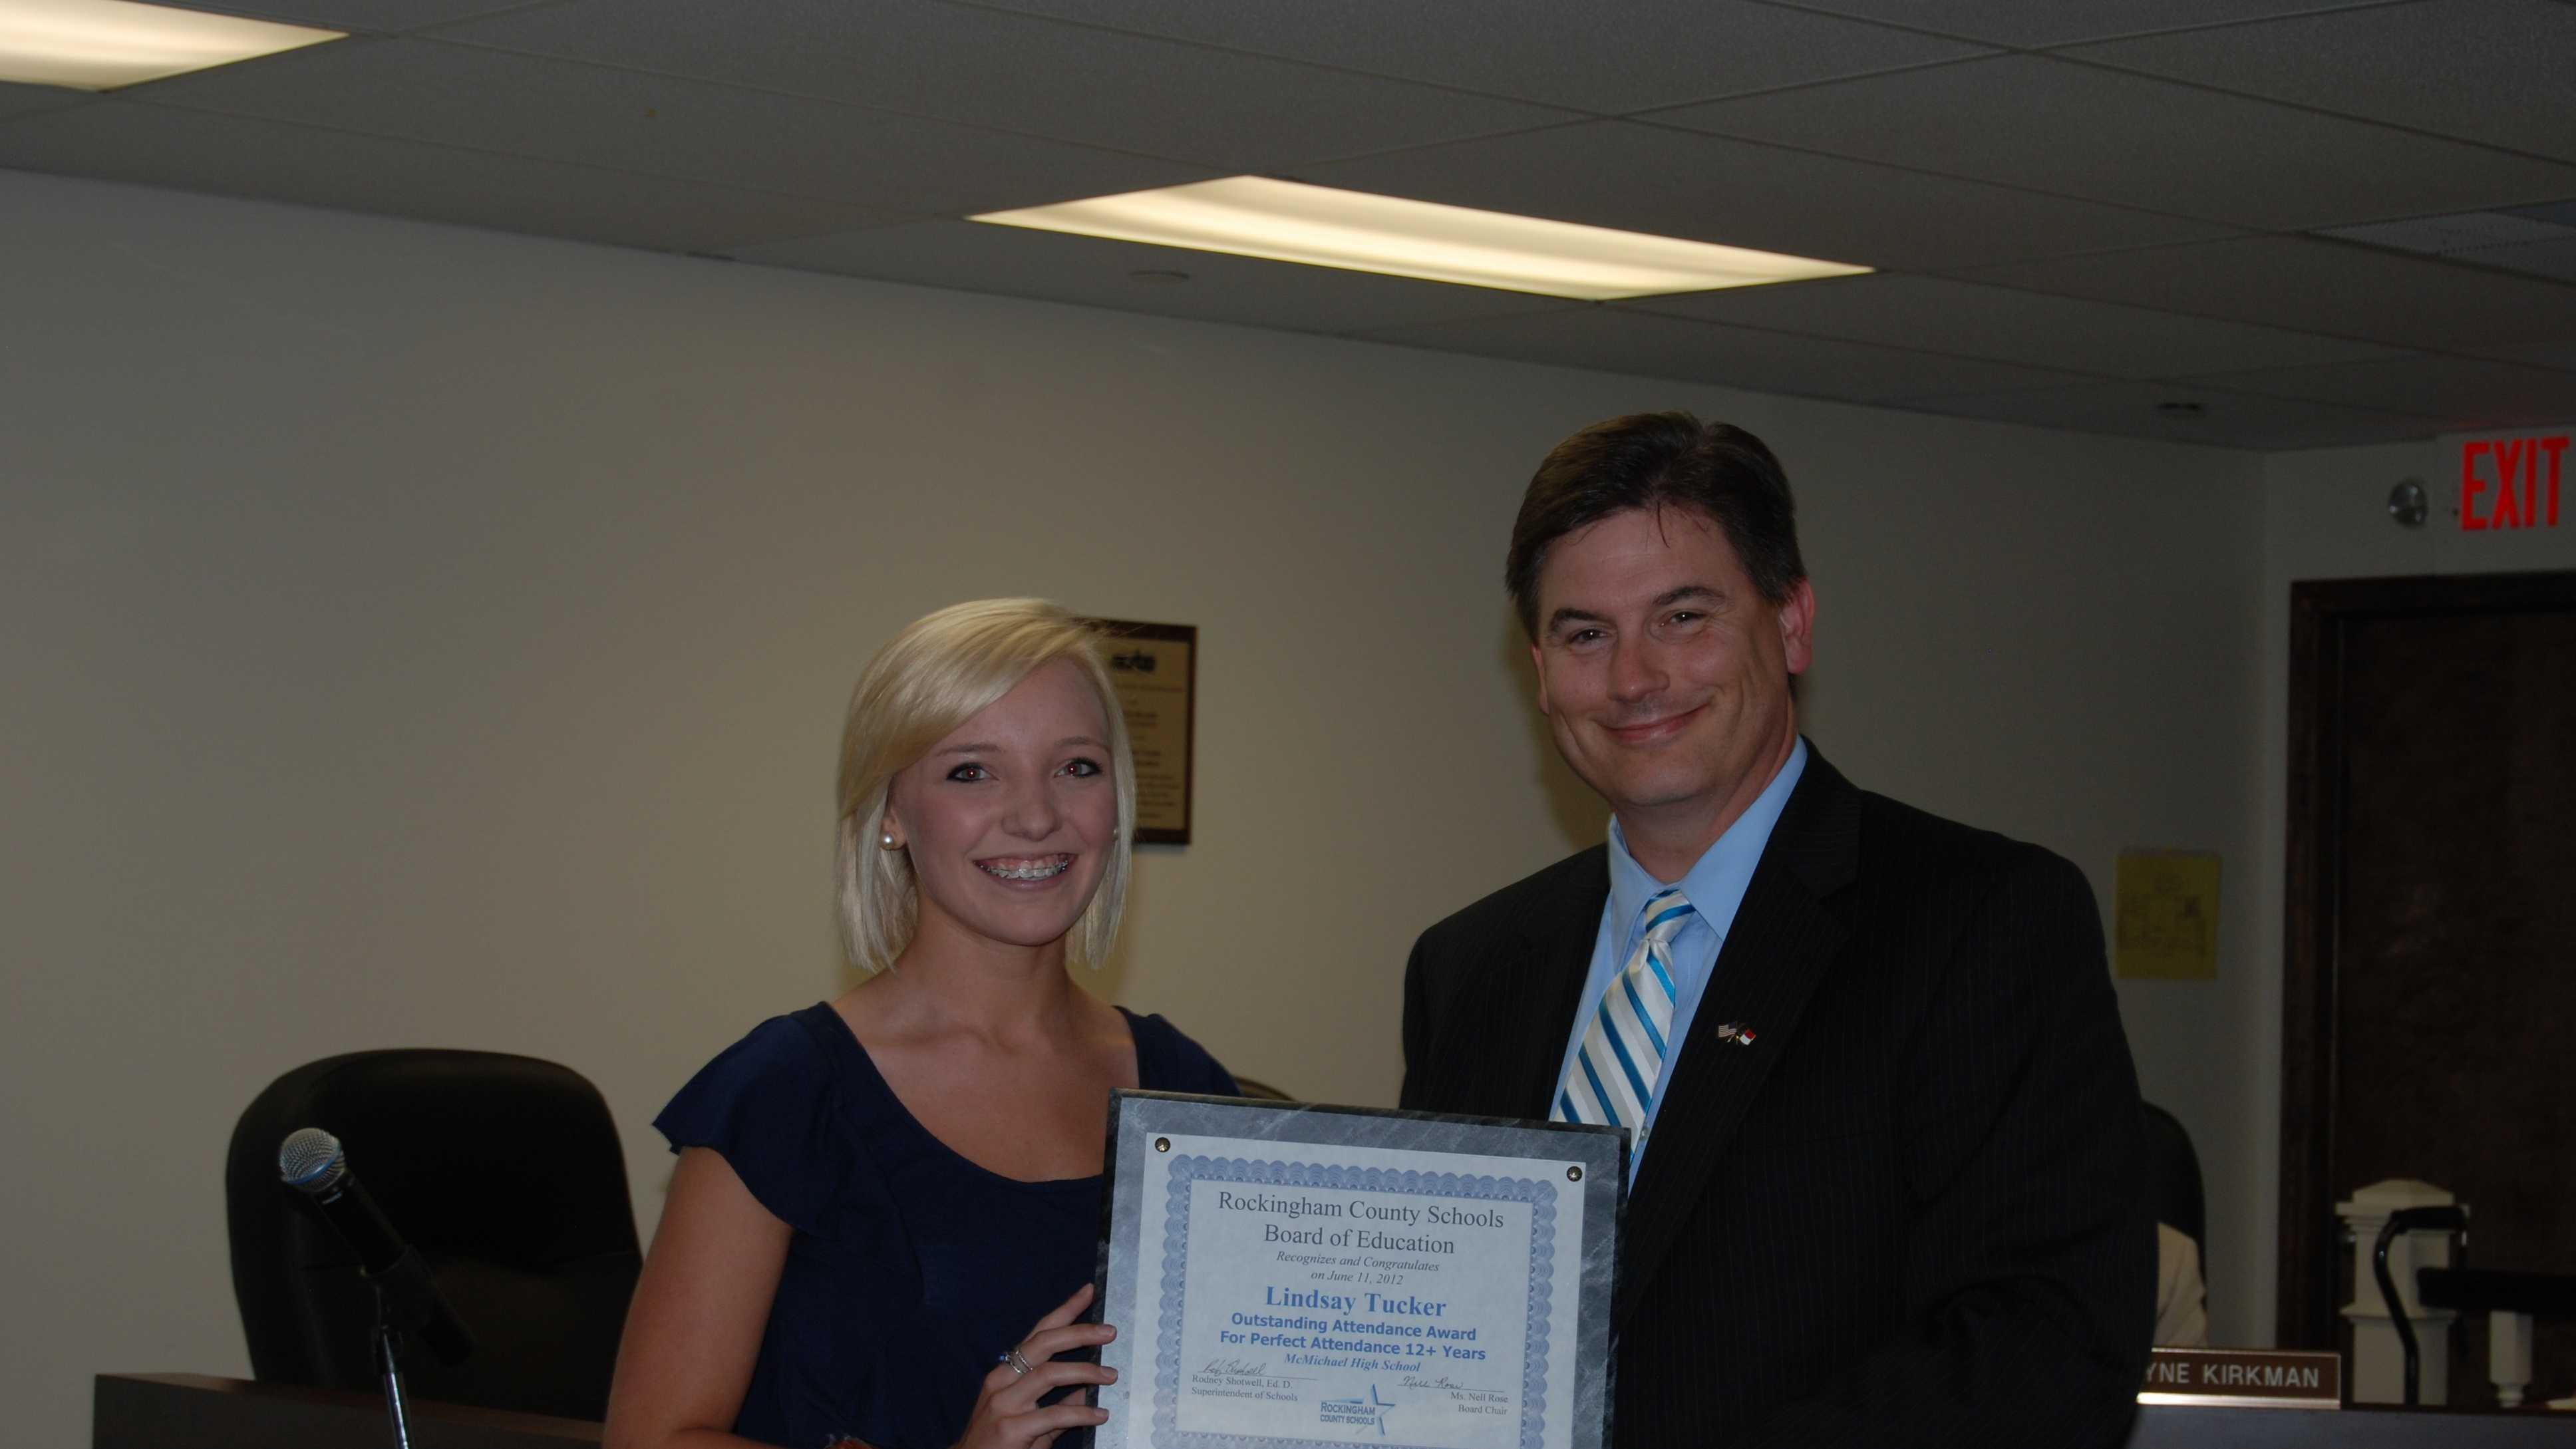 Lindsay Tucker (photo by Rockingham County Schools)